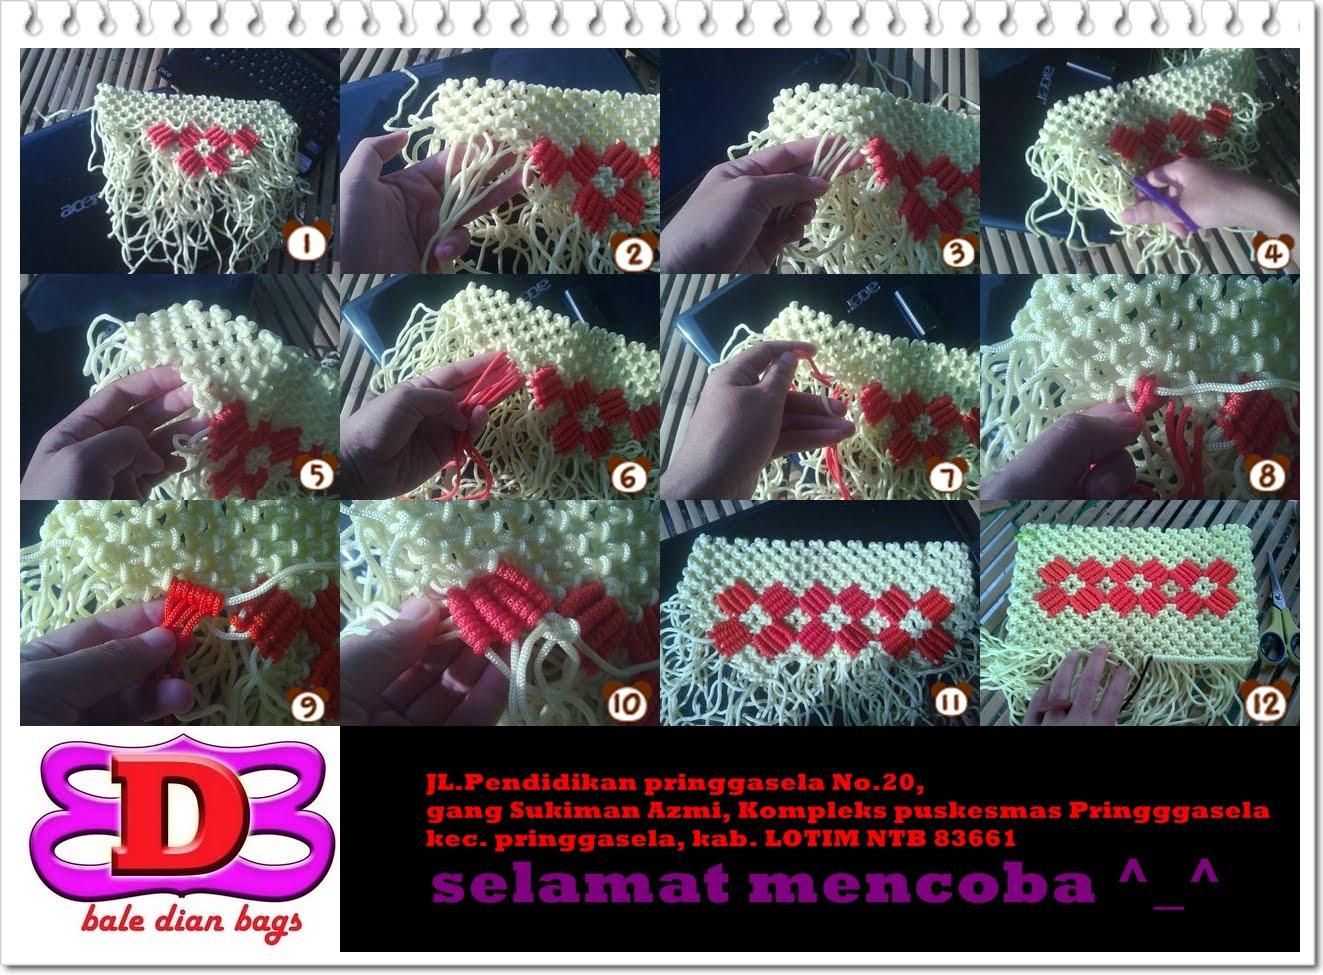 Daftar episode BoBoiBoy - Wikipedia bahasa Indonesia